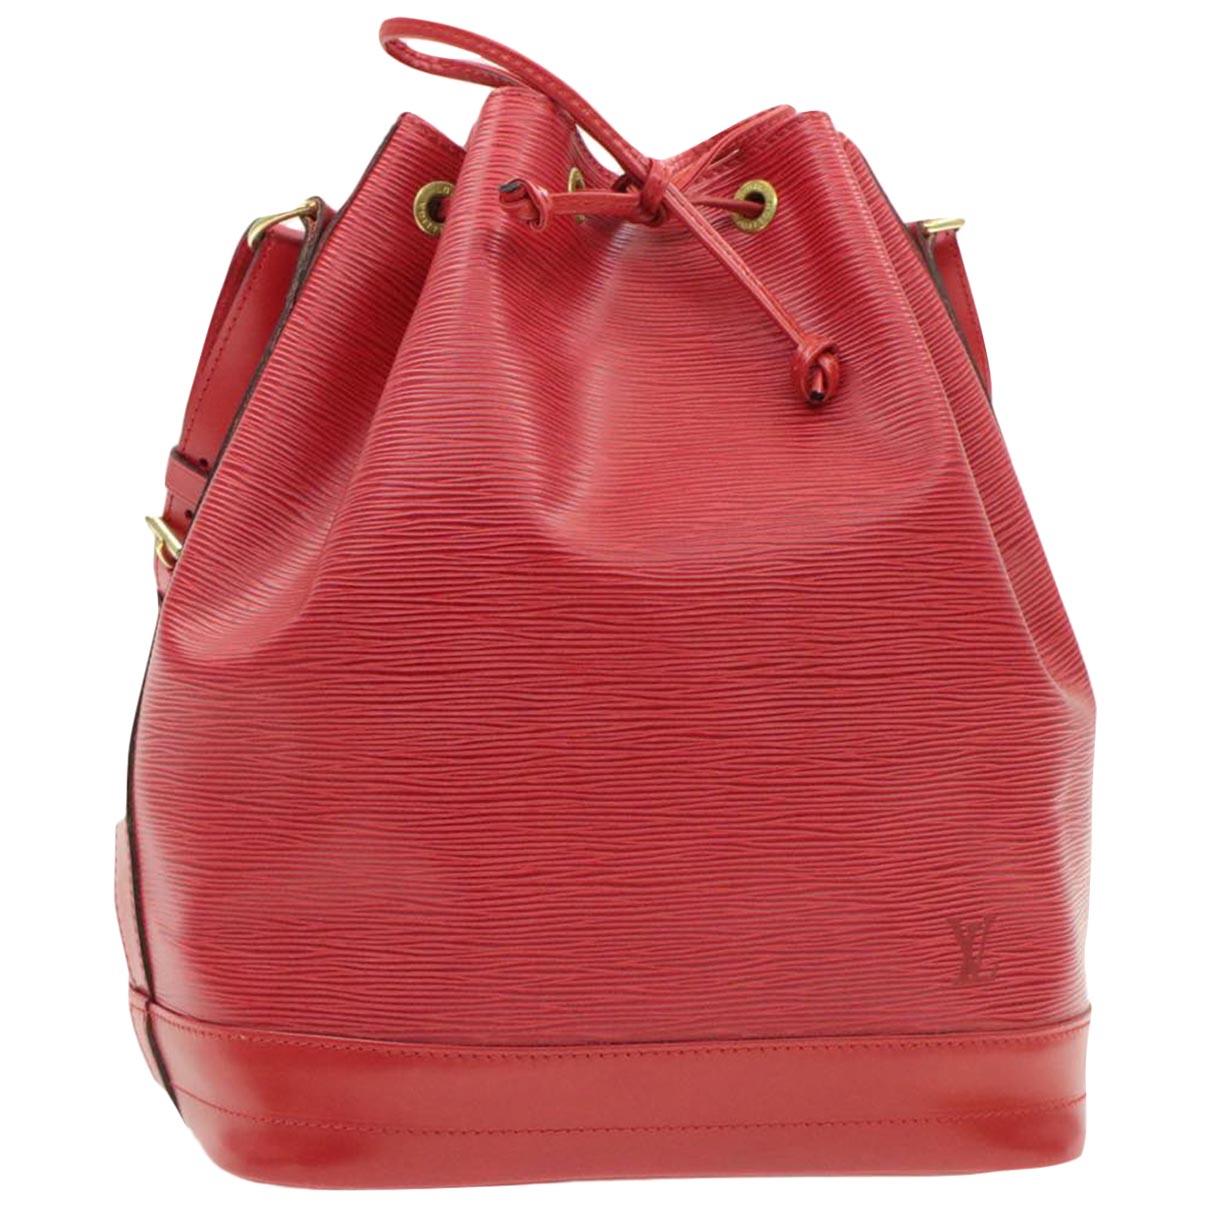 Bolso Petit Noe trunk de Cuero Louis Vuitton